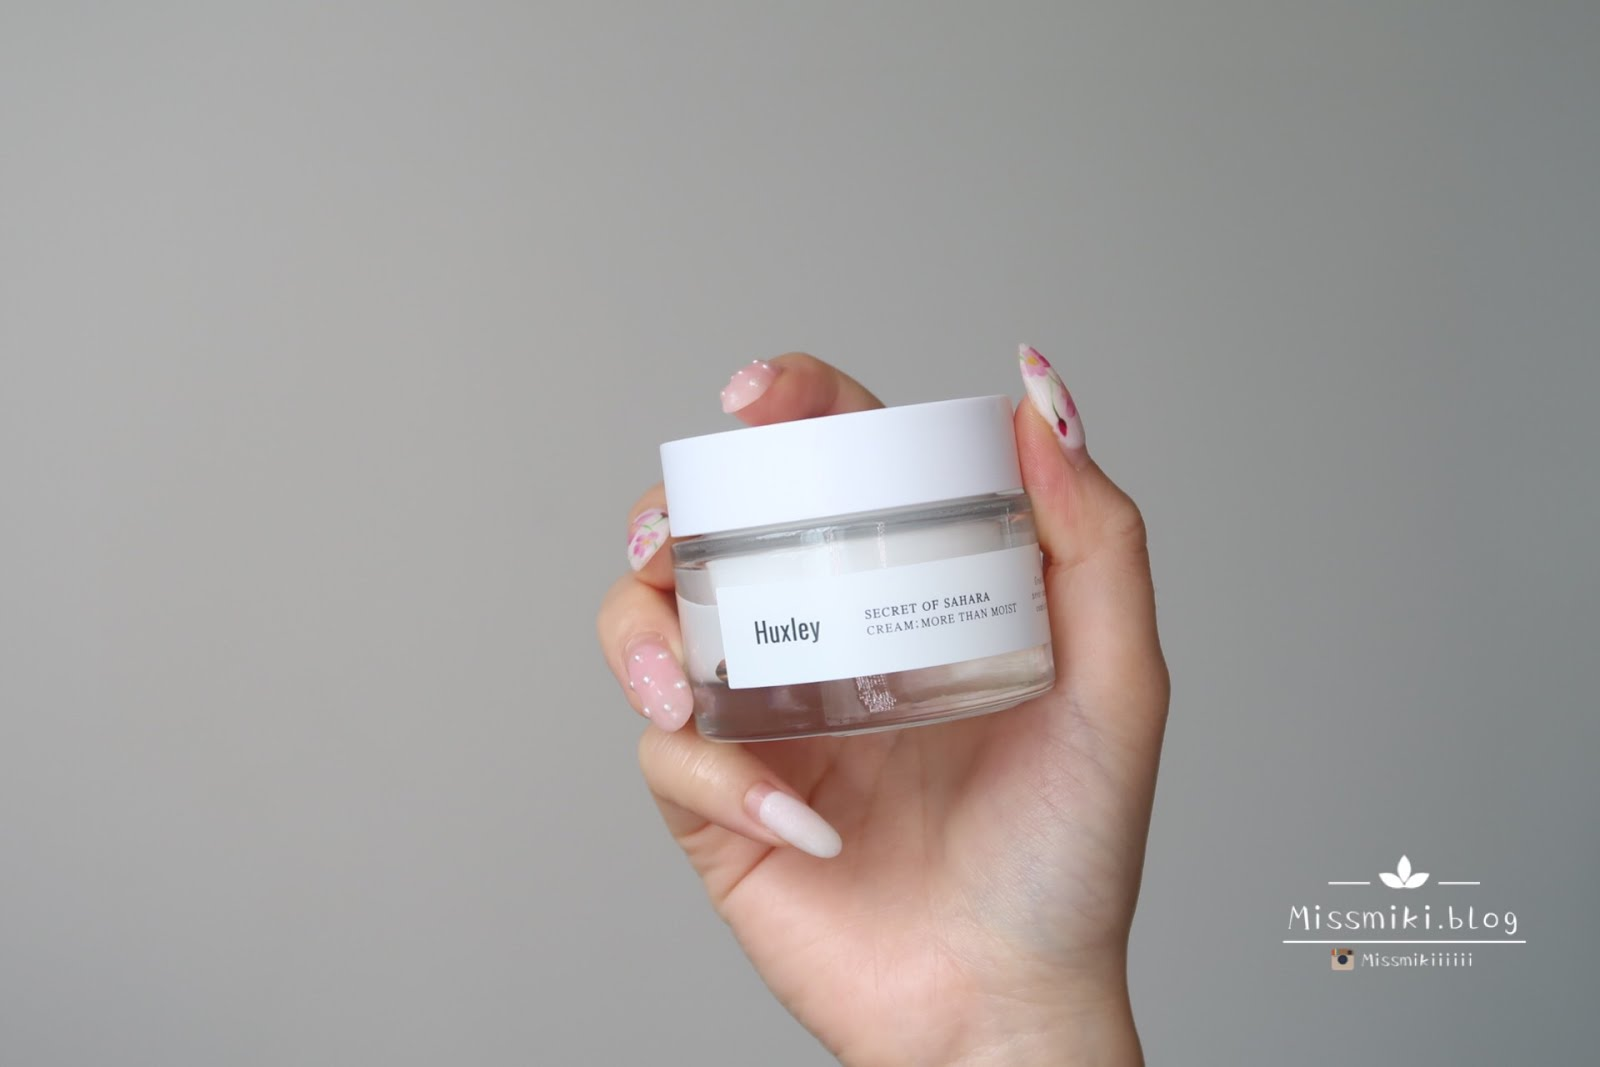 190eb95db0f6c Beautylife HK - 仙人掌種子護膚品?|莎莎都有得賣|韓國天然有機護膚品 ...